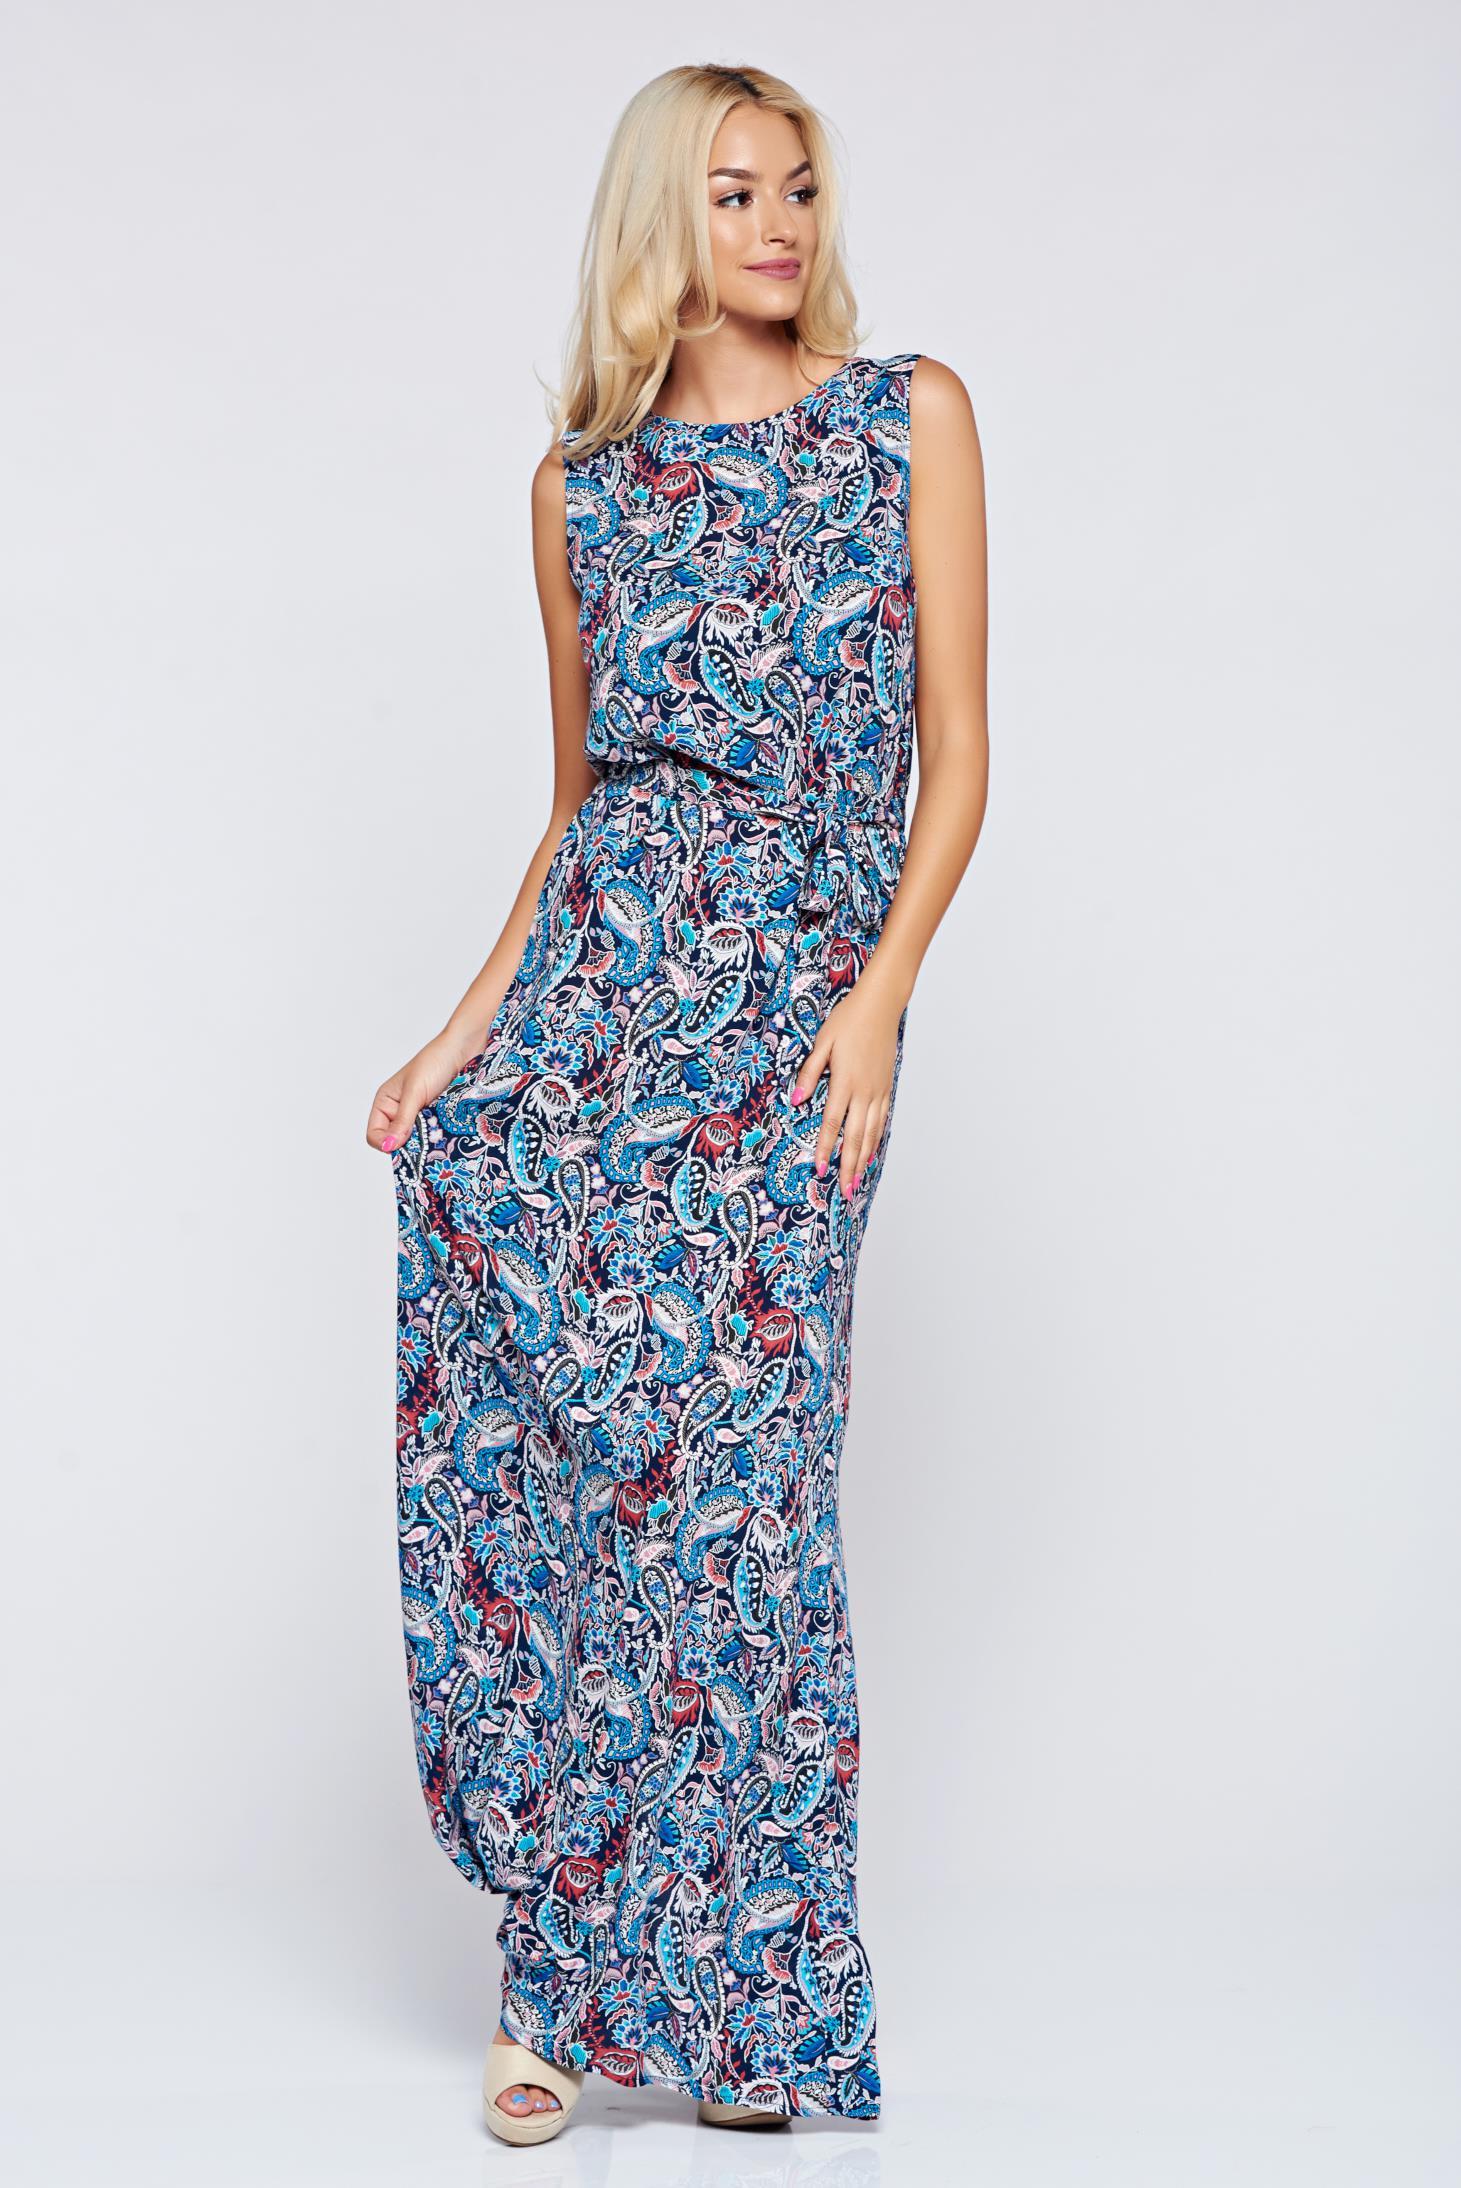 Rochie Top Secret albastru-inchis cu croi larg cu imprimeuri florale